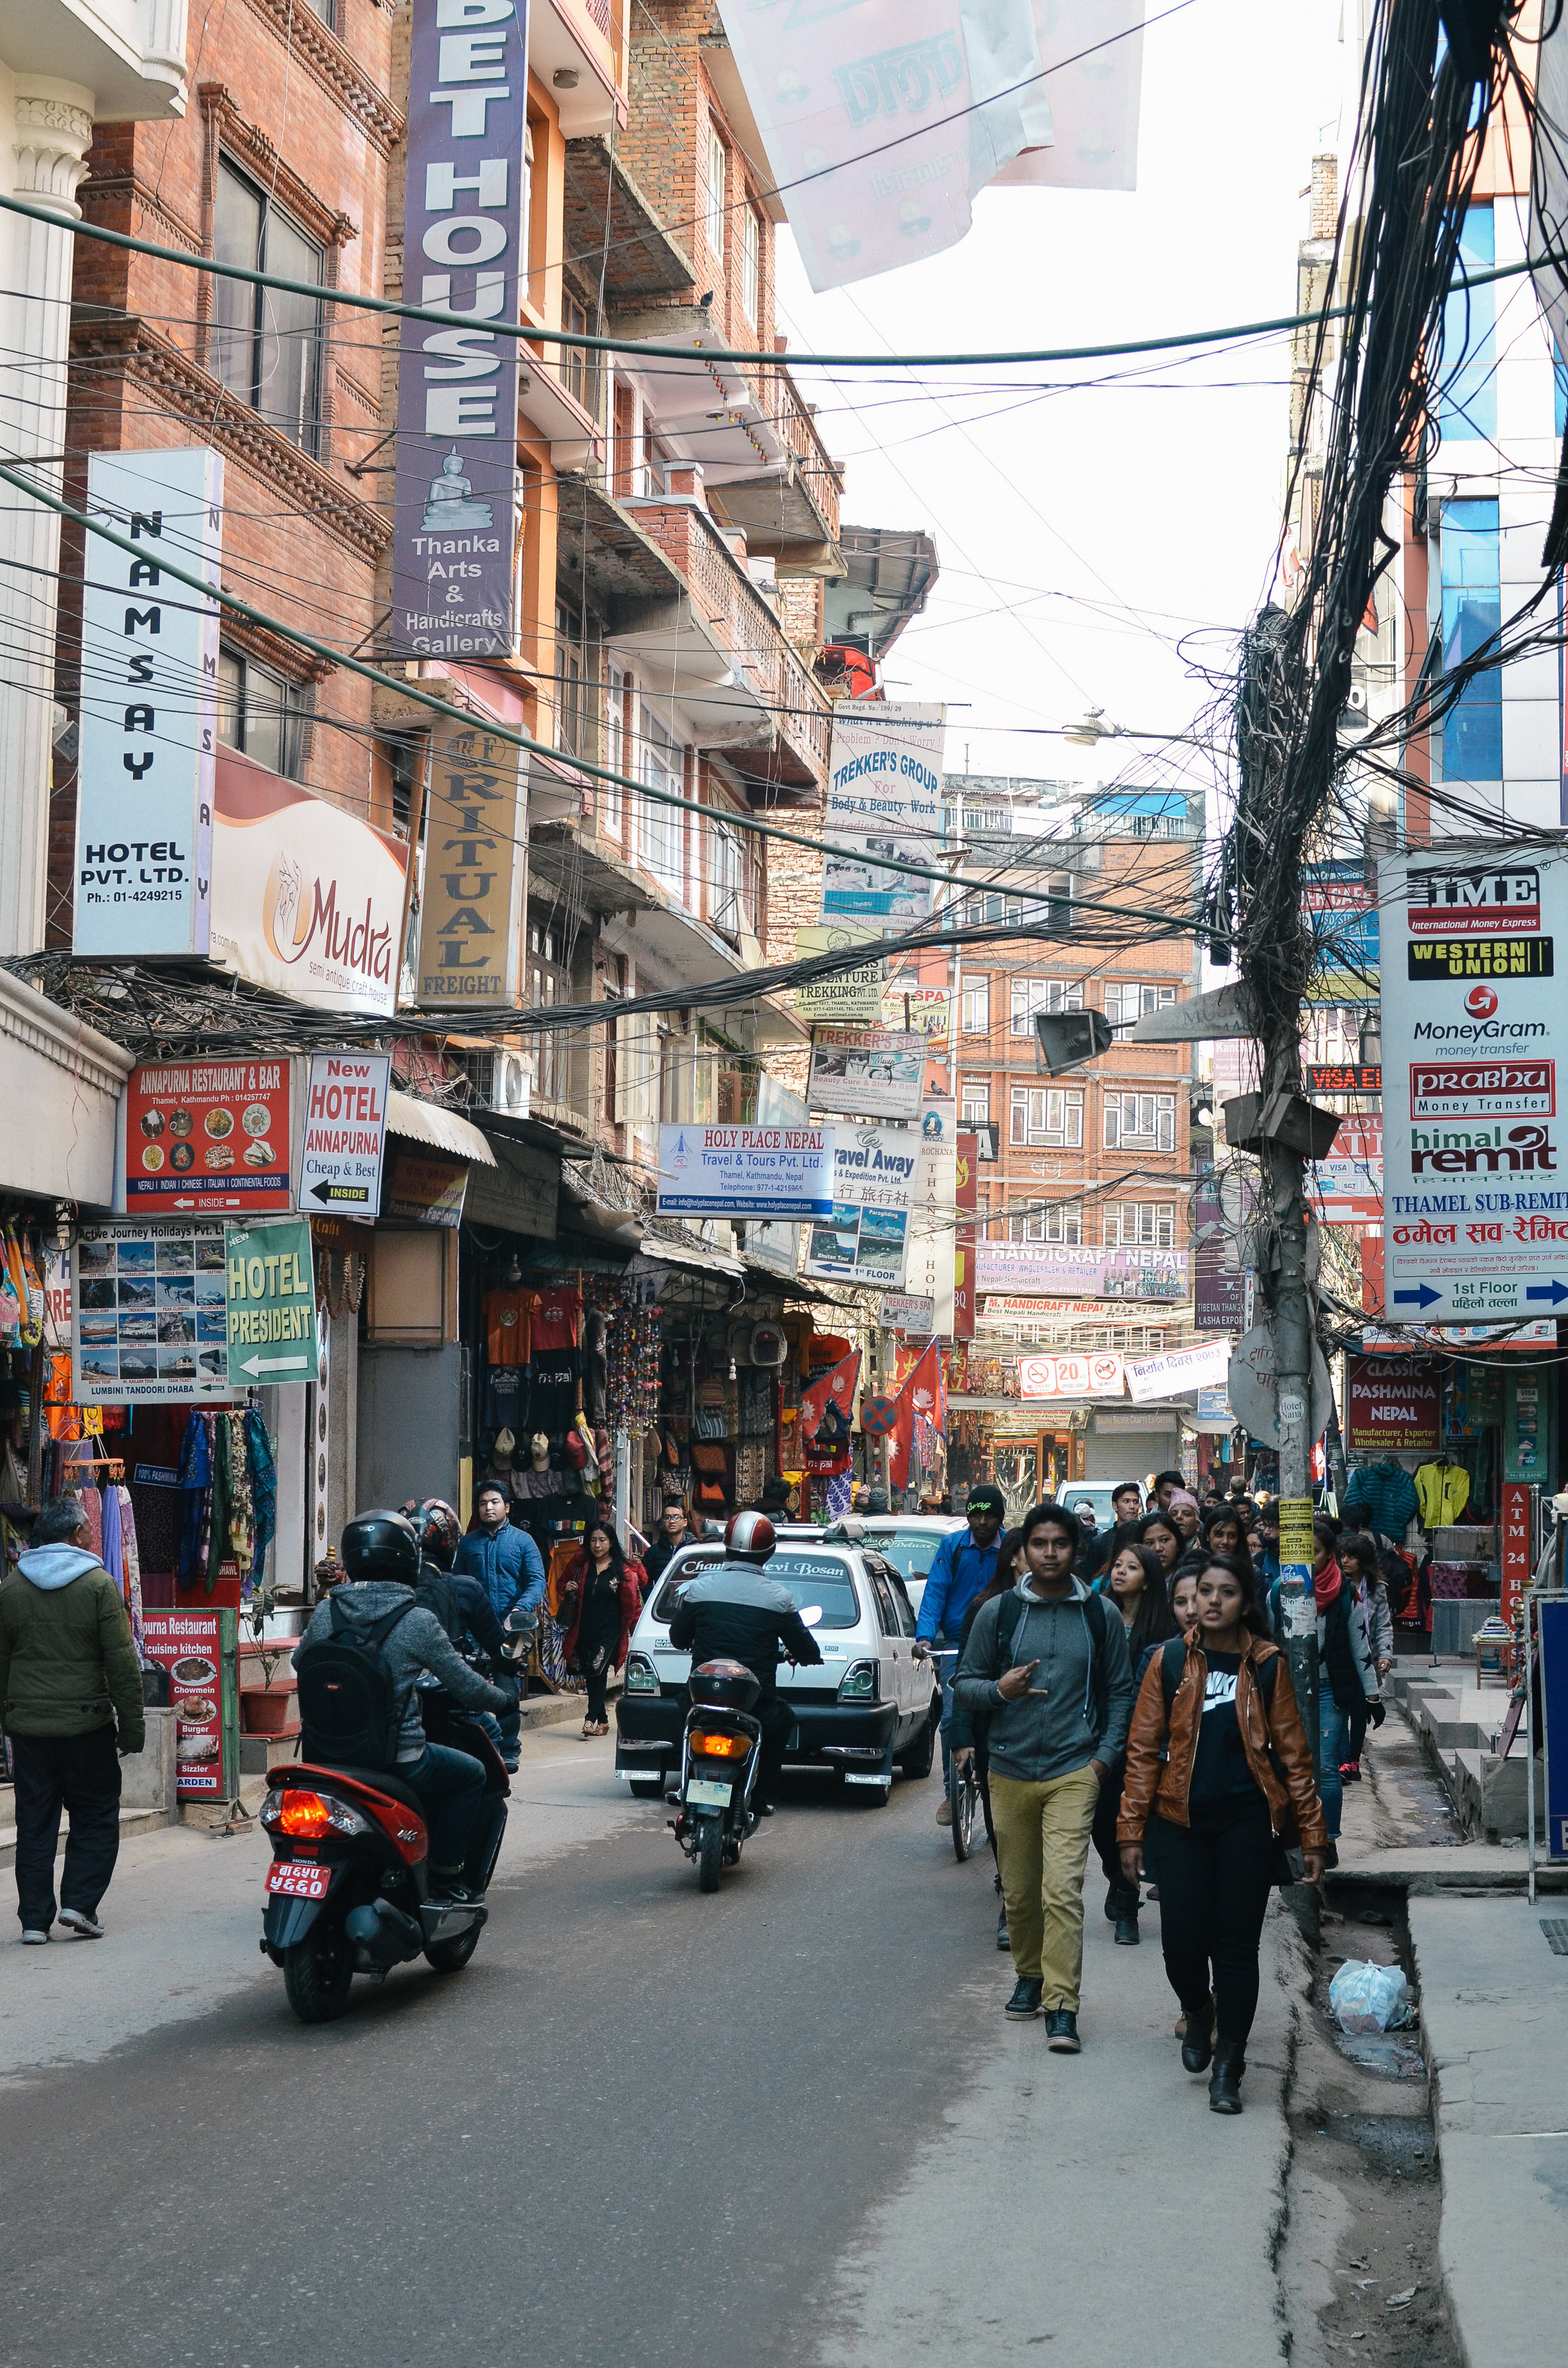 10-things-to-know-kathmandu-nepal-lifeonpine_DSC_0529.jpg